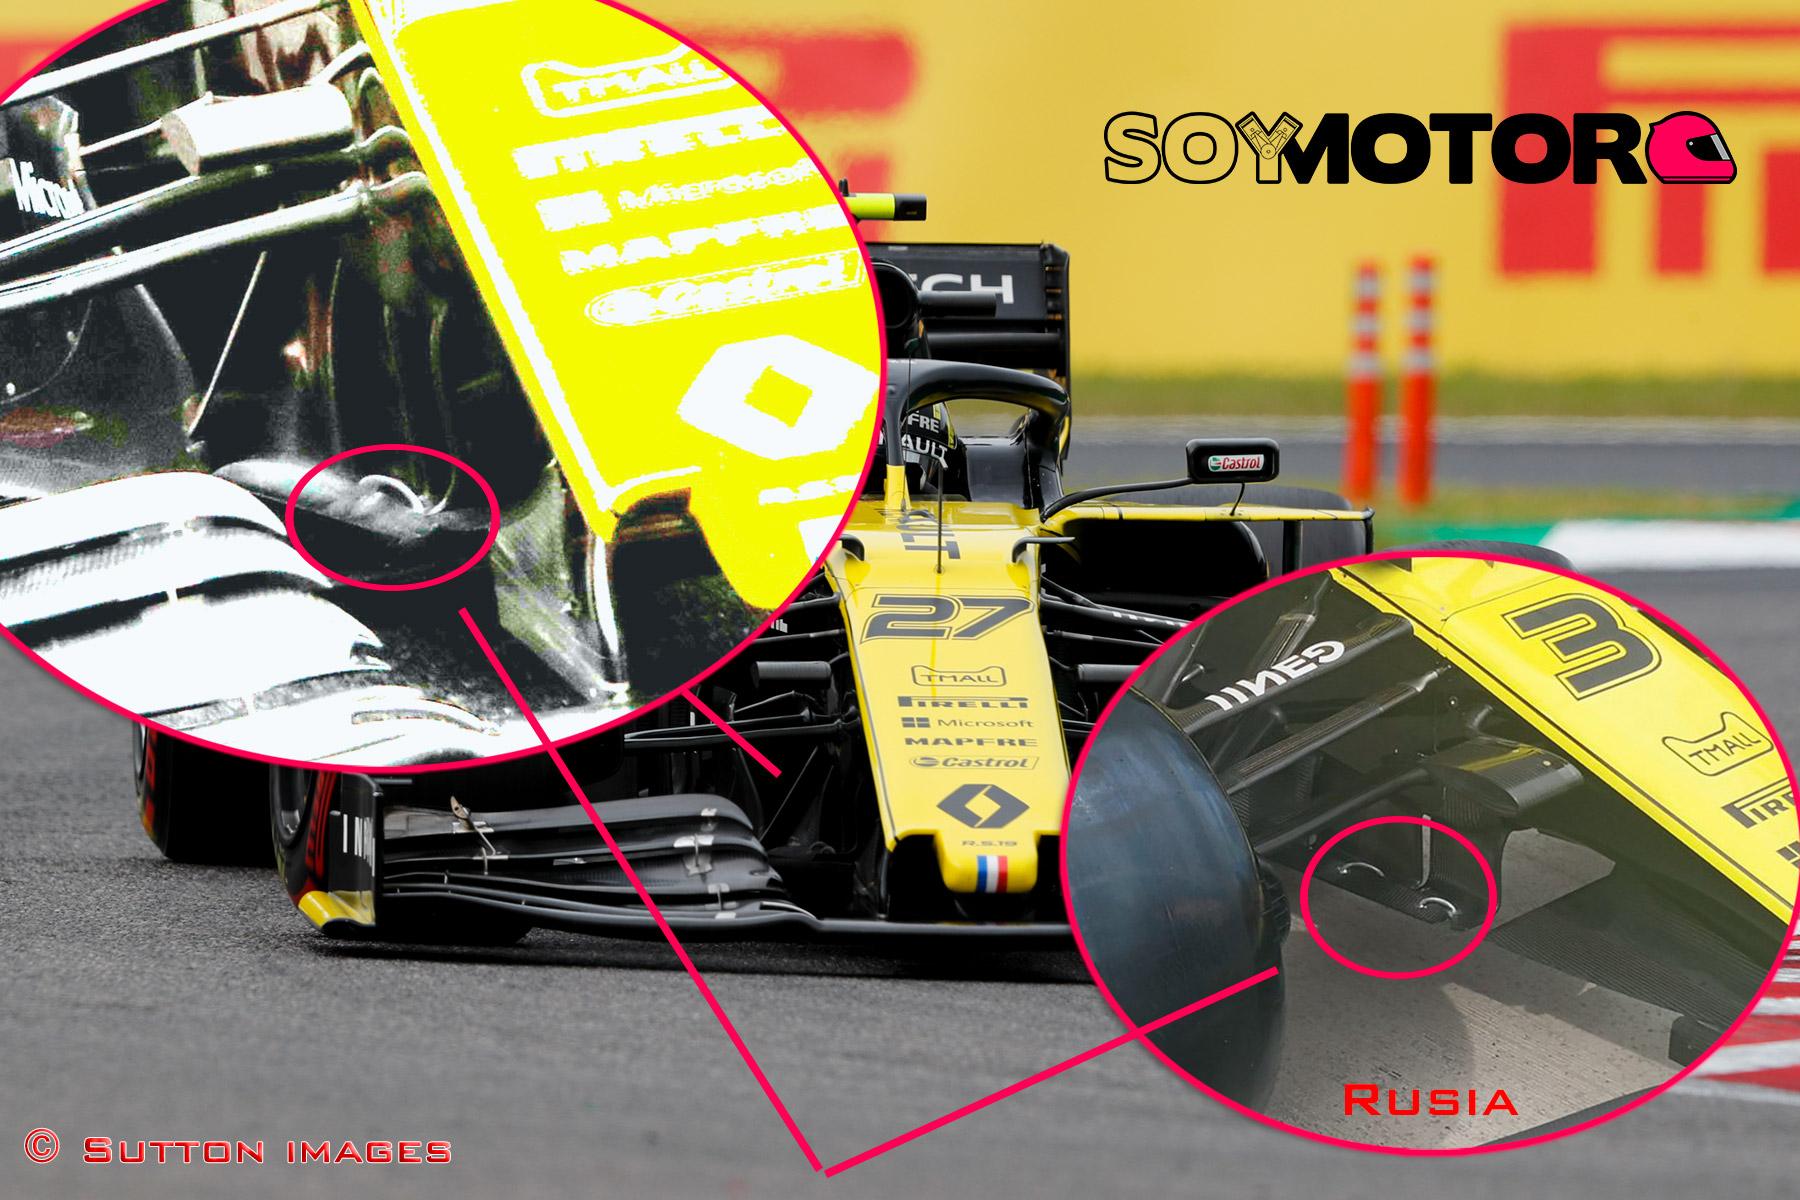 renault-turning-vanes-soymotor.jpg